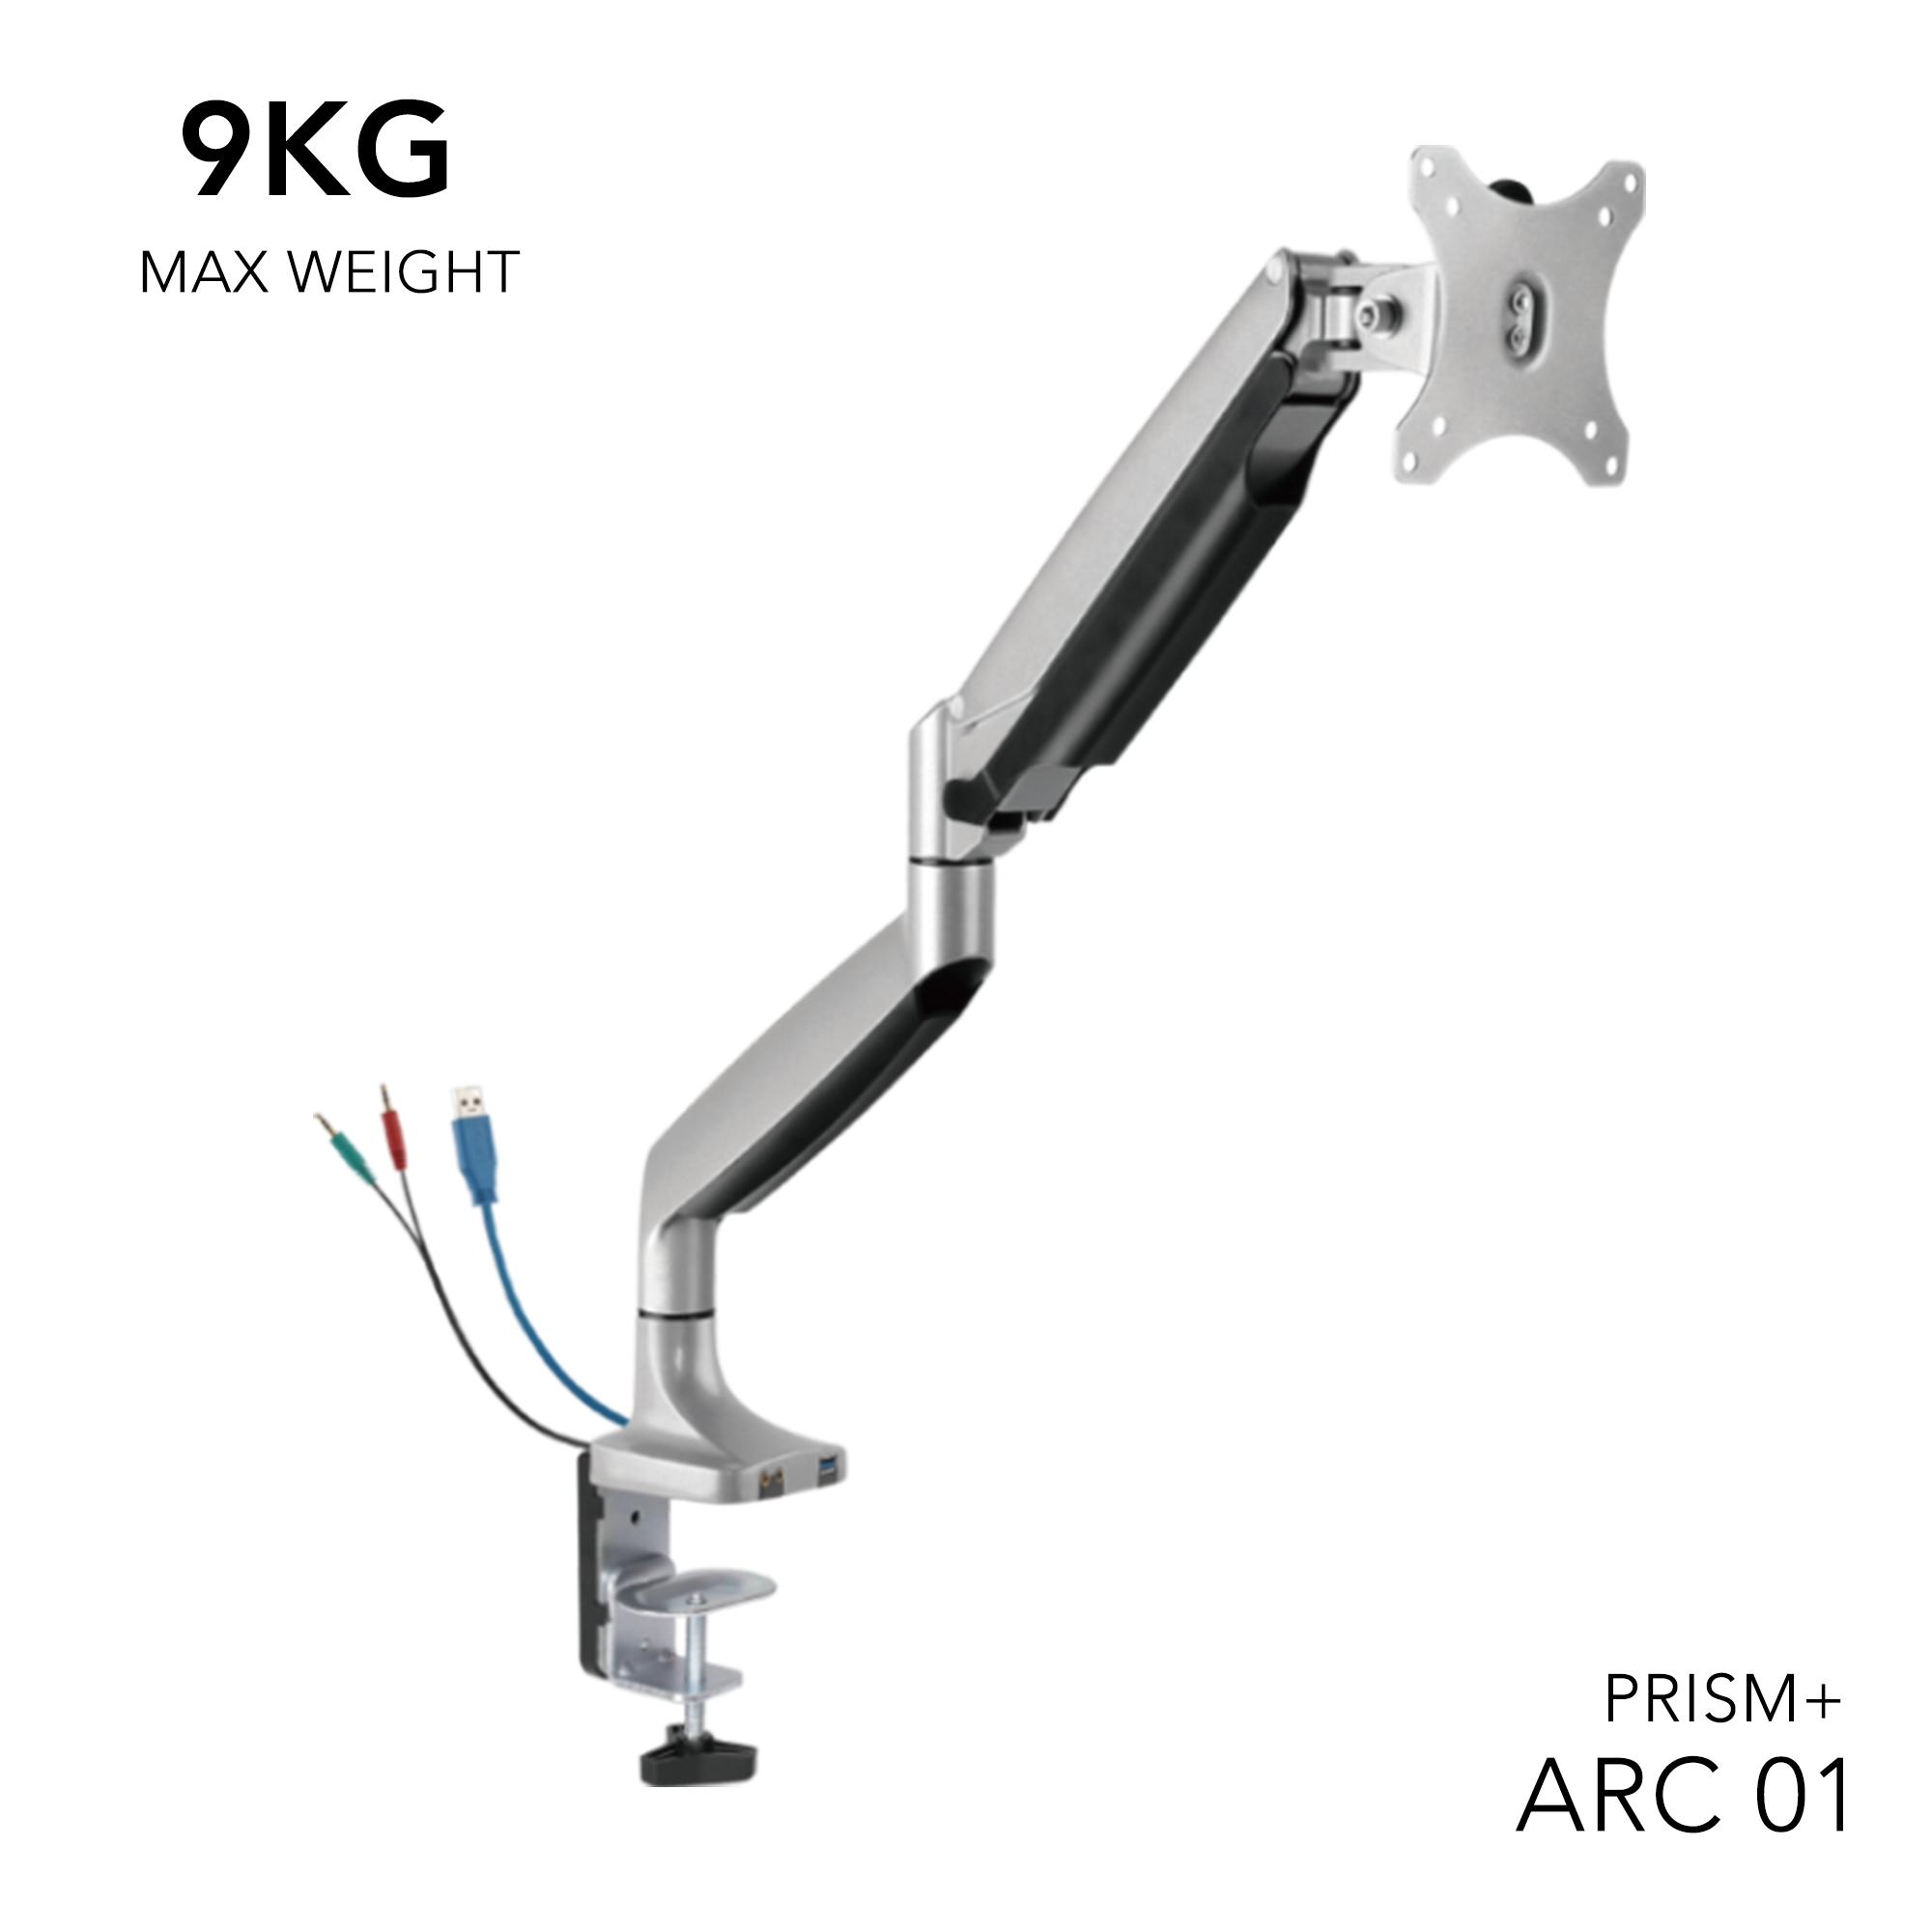 Prism+ ARC 01 Single Monitor VESA Monitor Arm